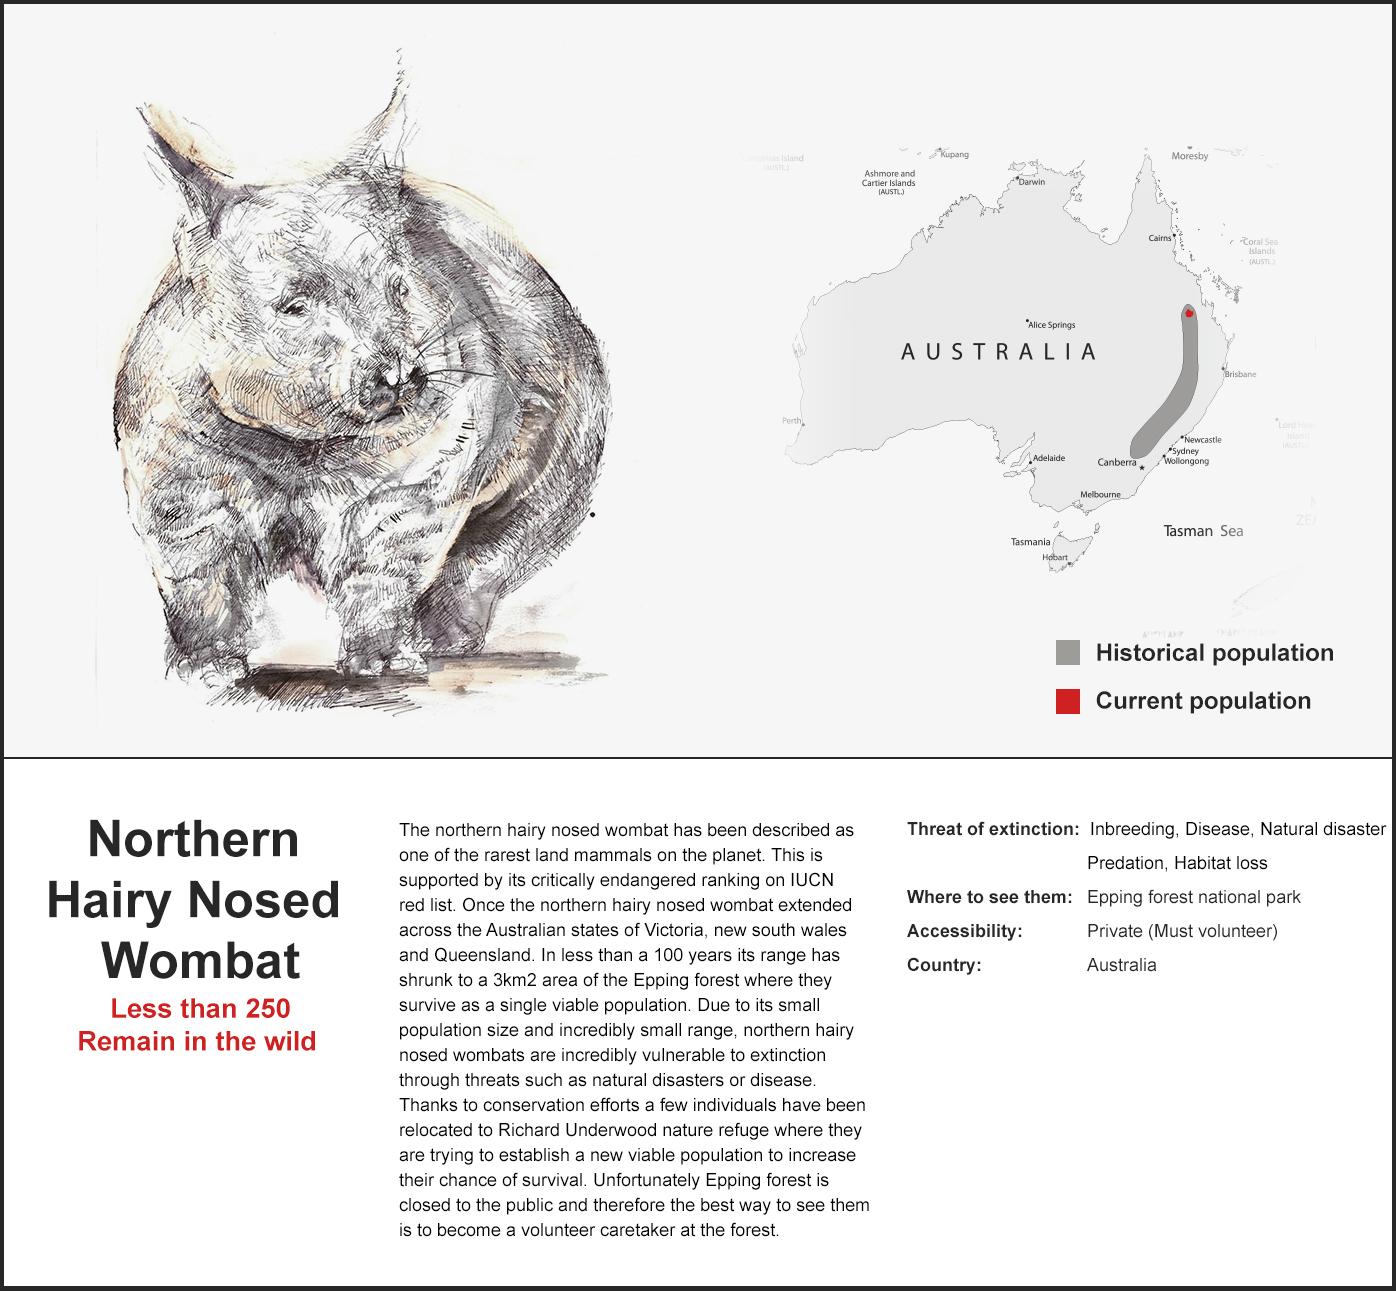 Photos amazing nosed northern hairy vombatidae wombat